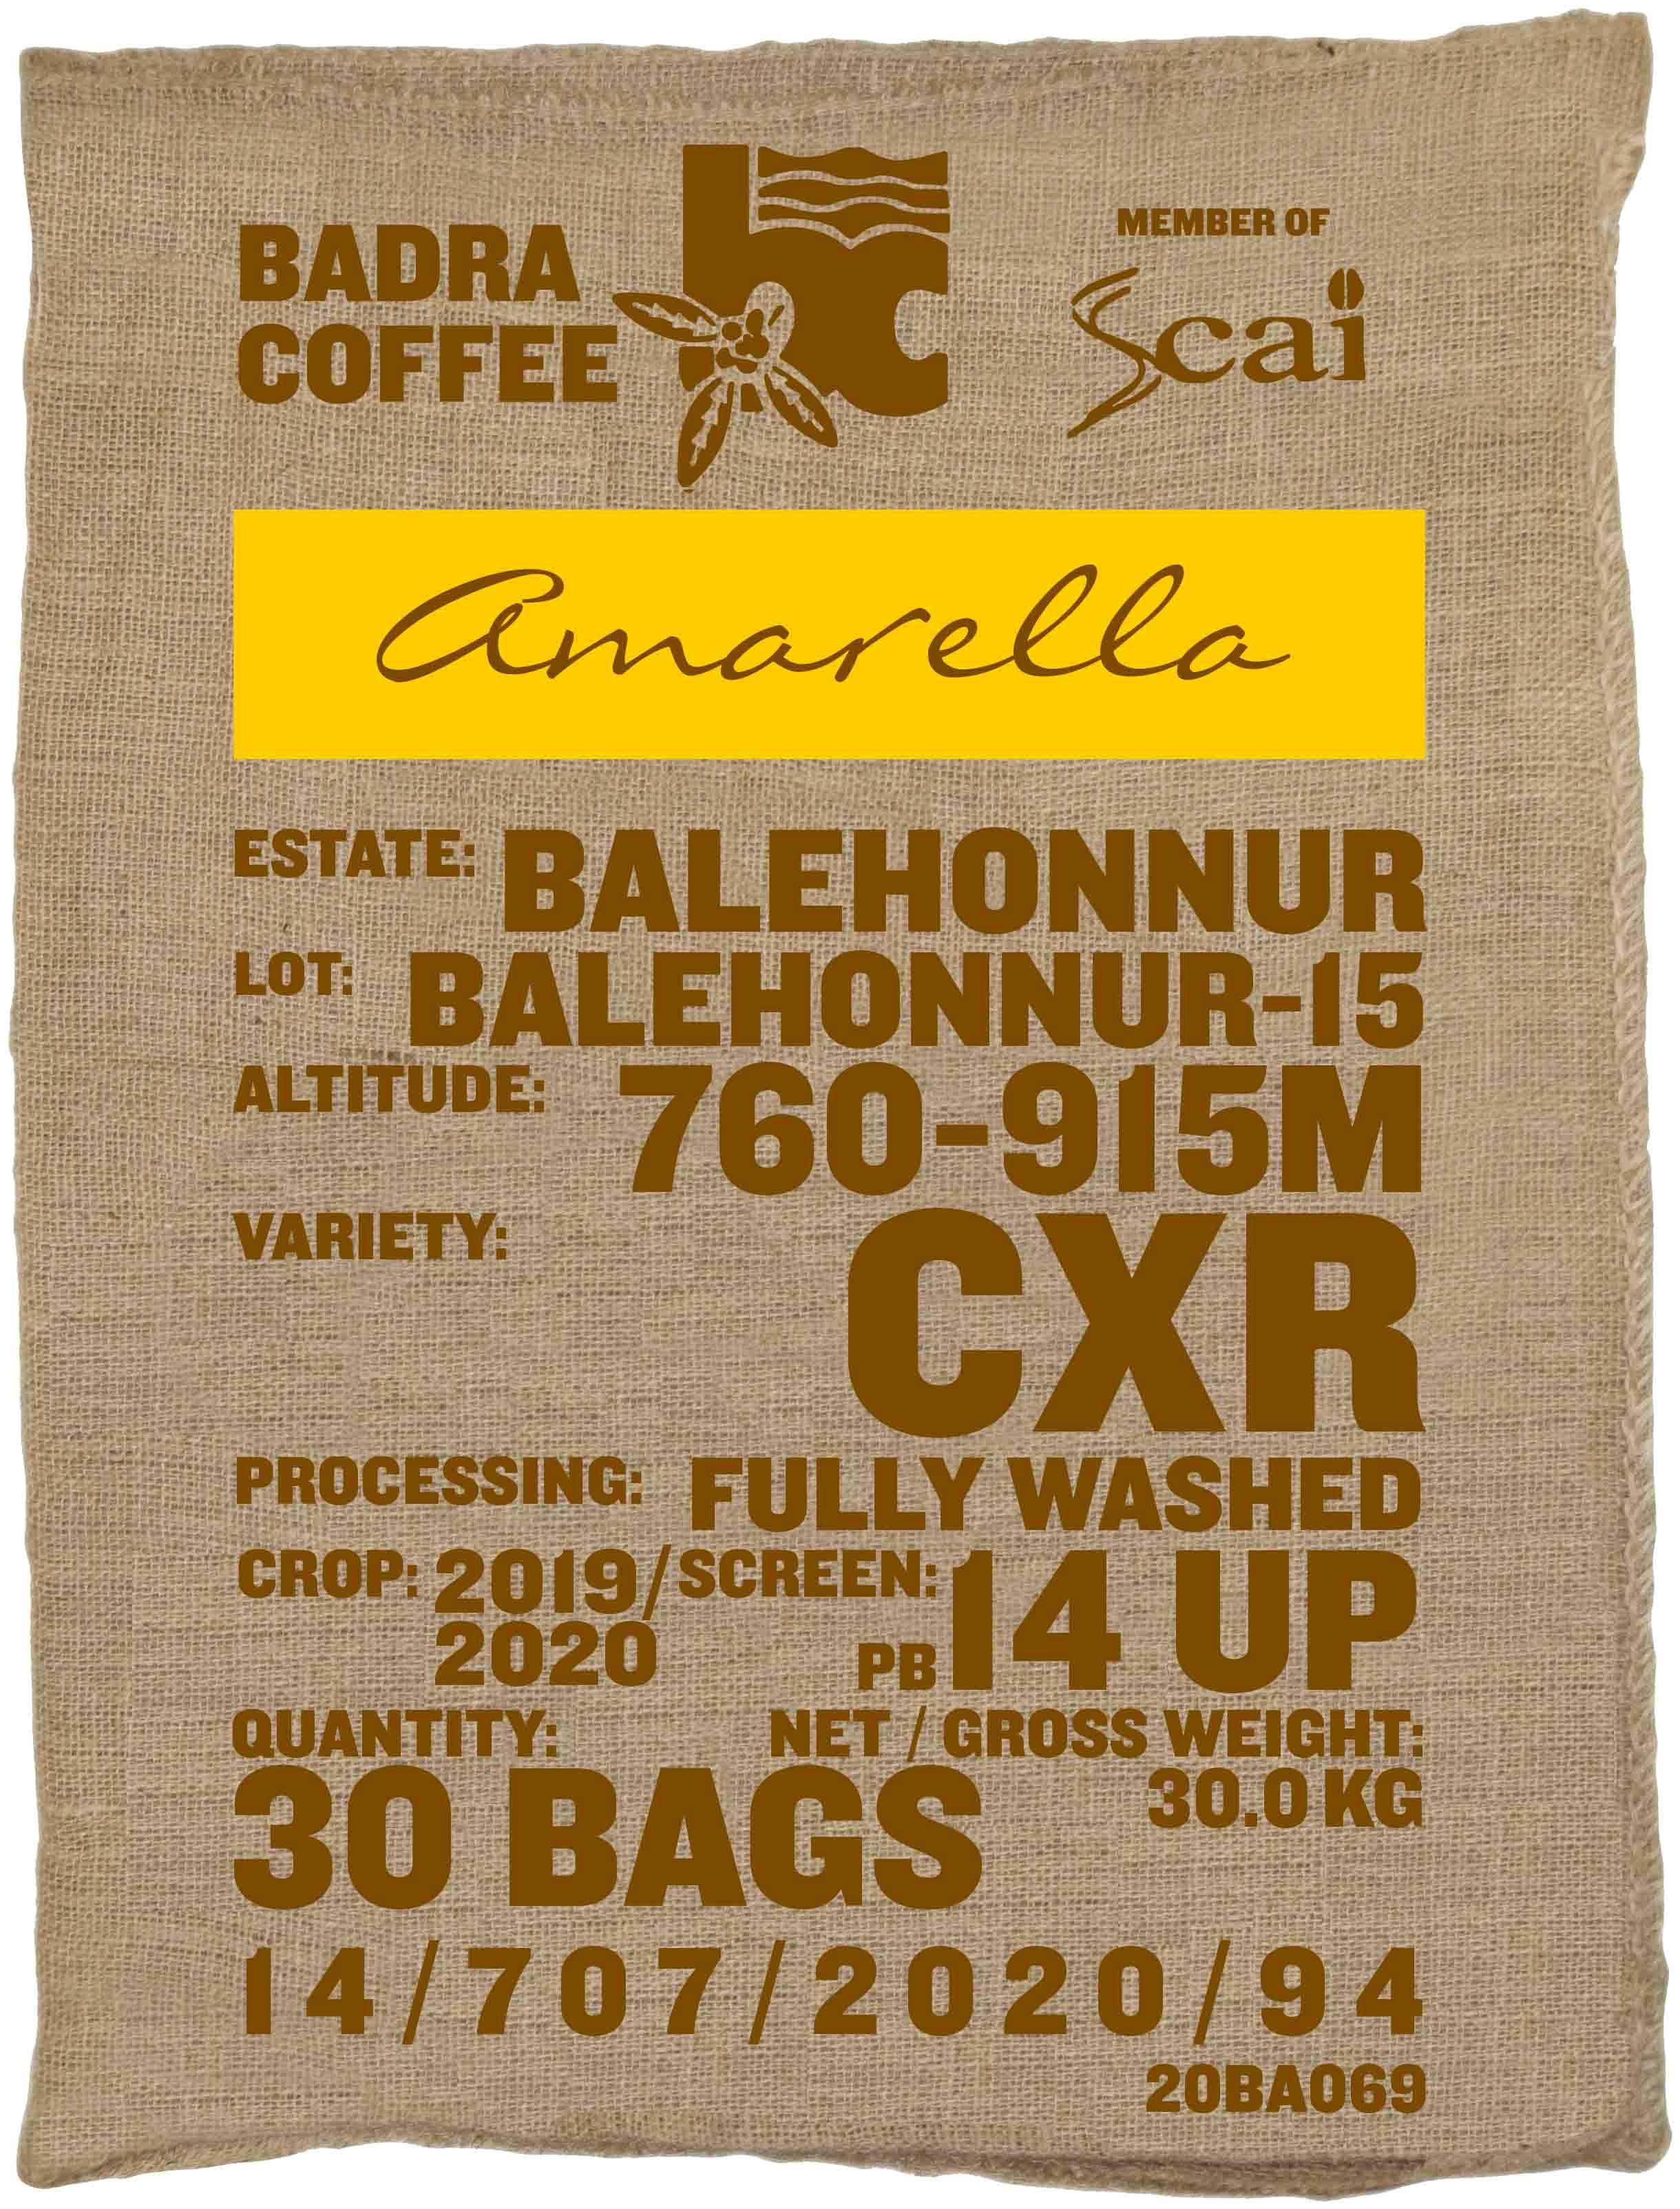 Ein Rohkaffeesack amarella Rohkaffee Varietät CxR. Badra Estates Lot Balehonnur 15.